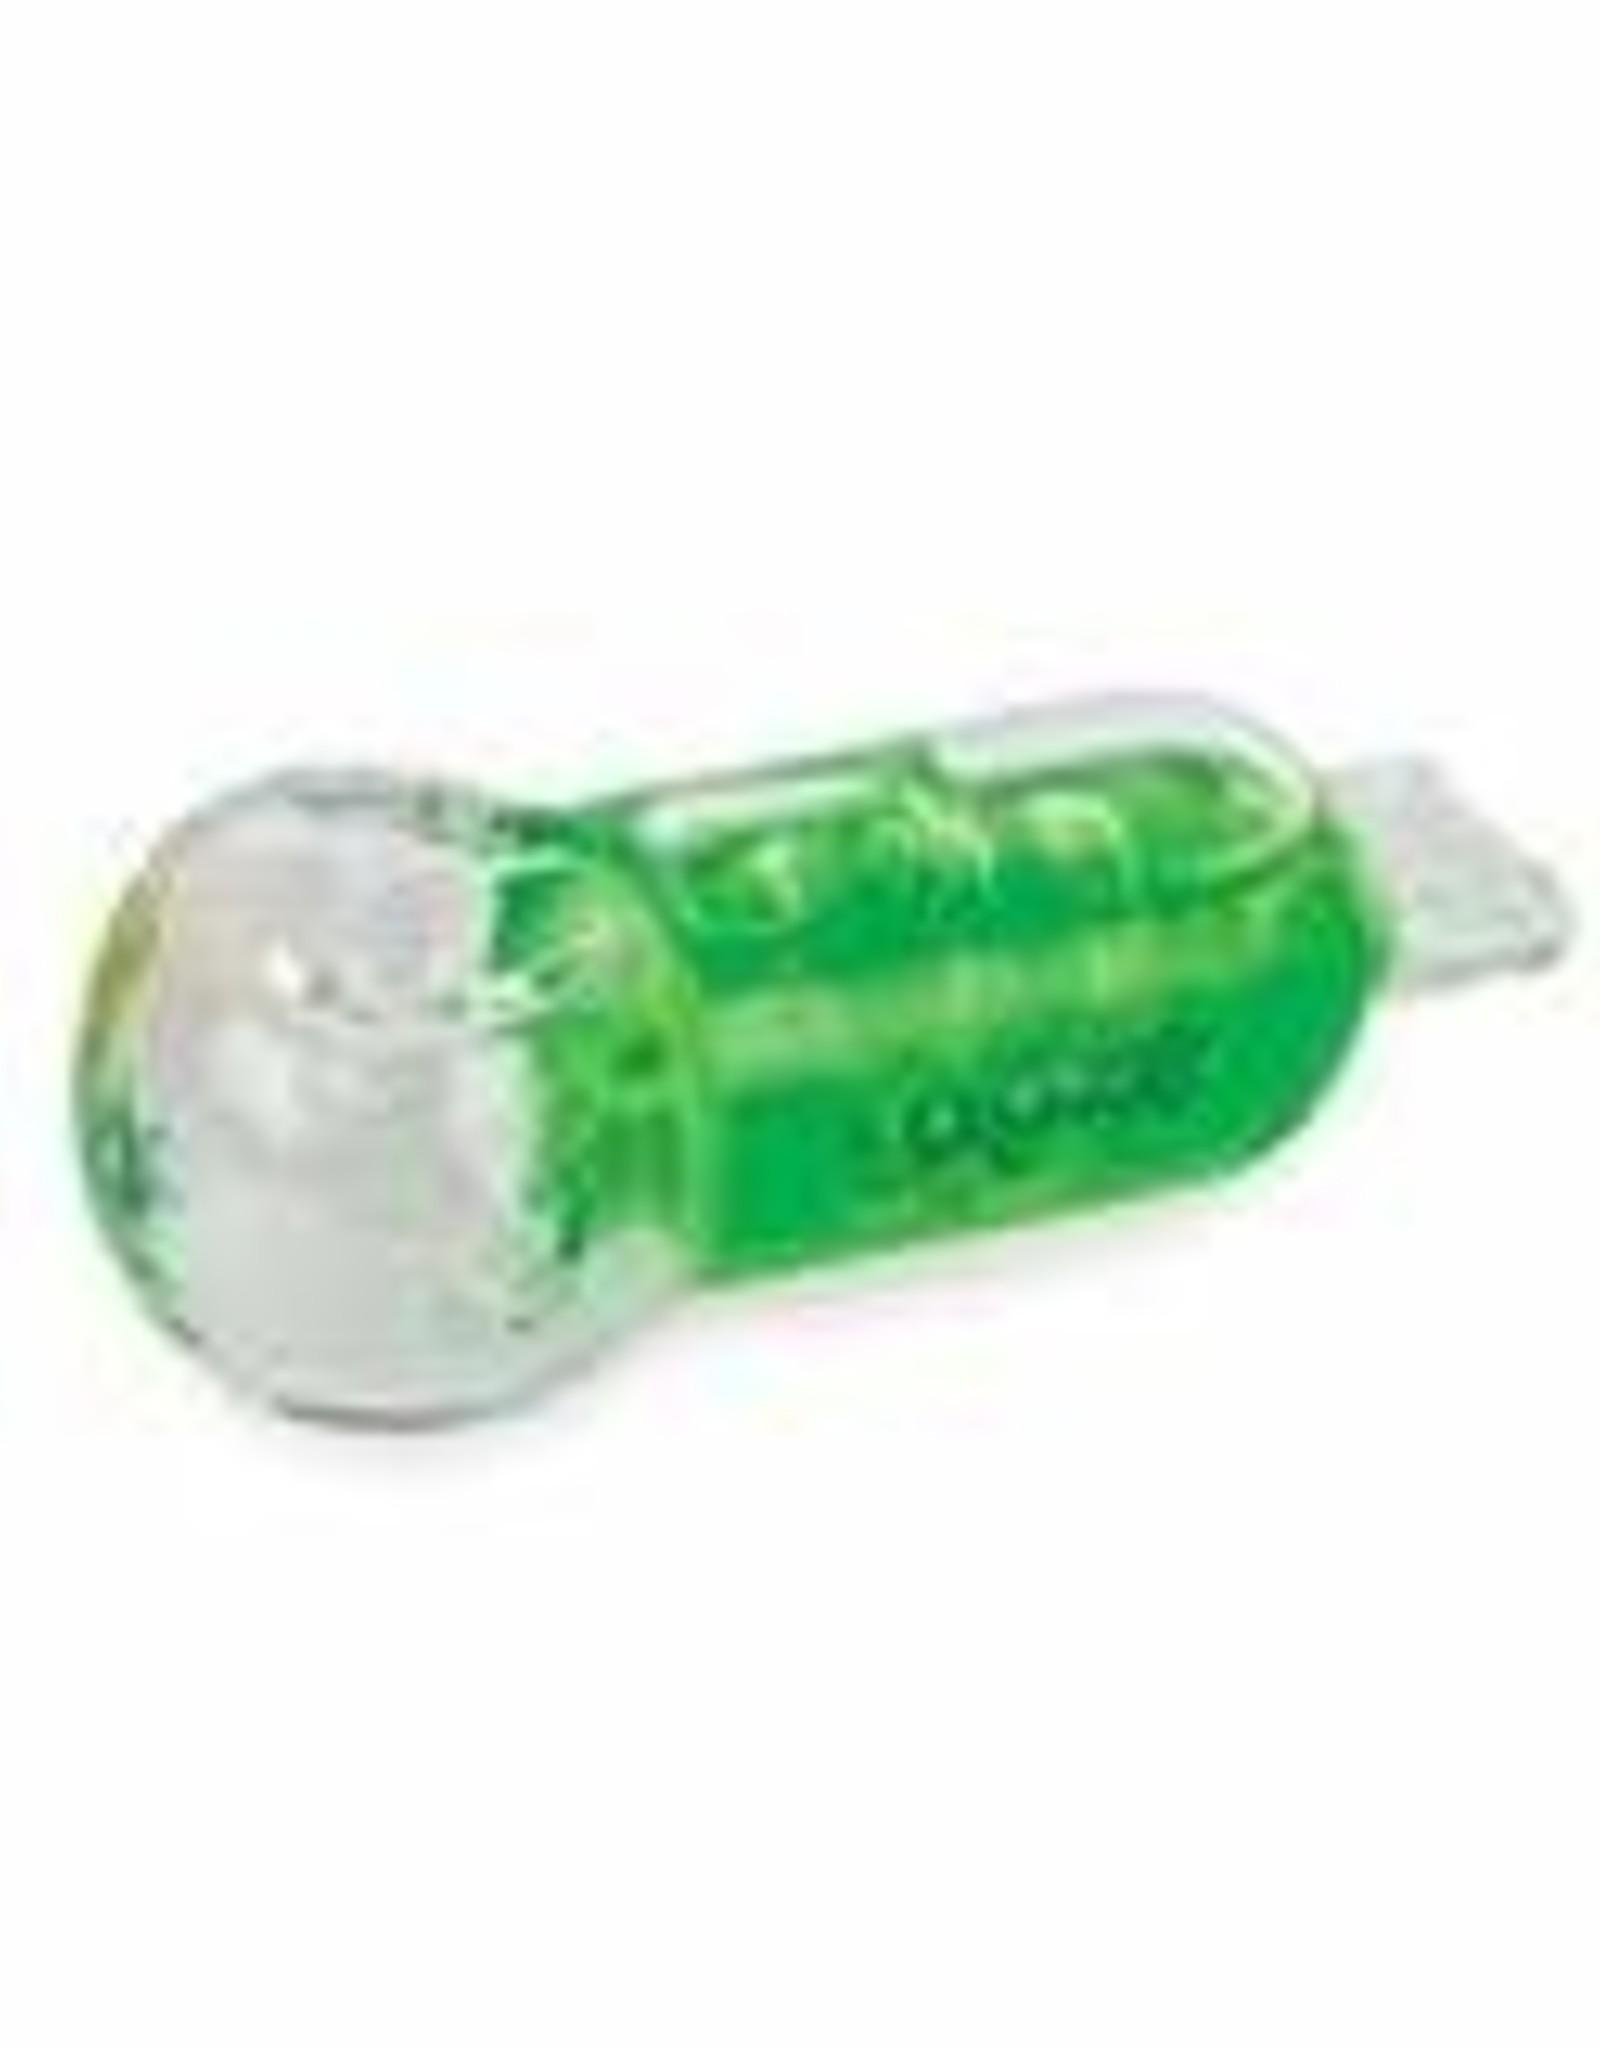 Ooze Cryo Freezable Glycerin Glass Bowl